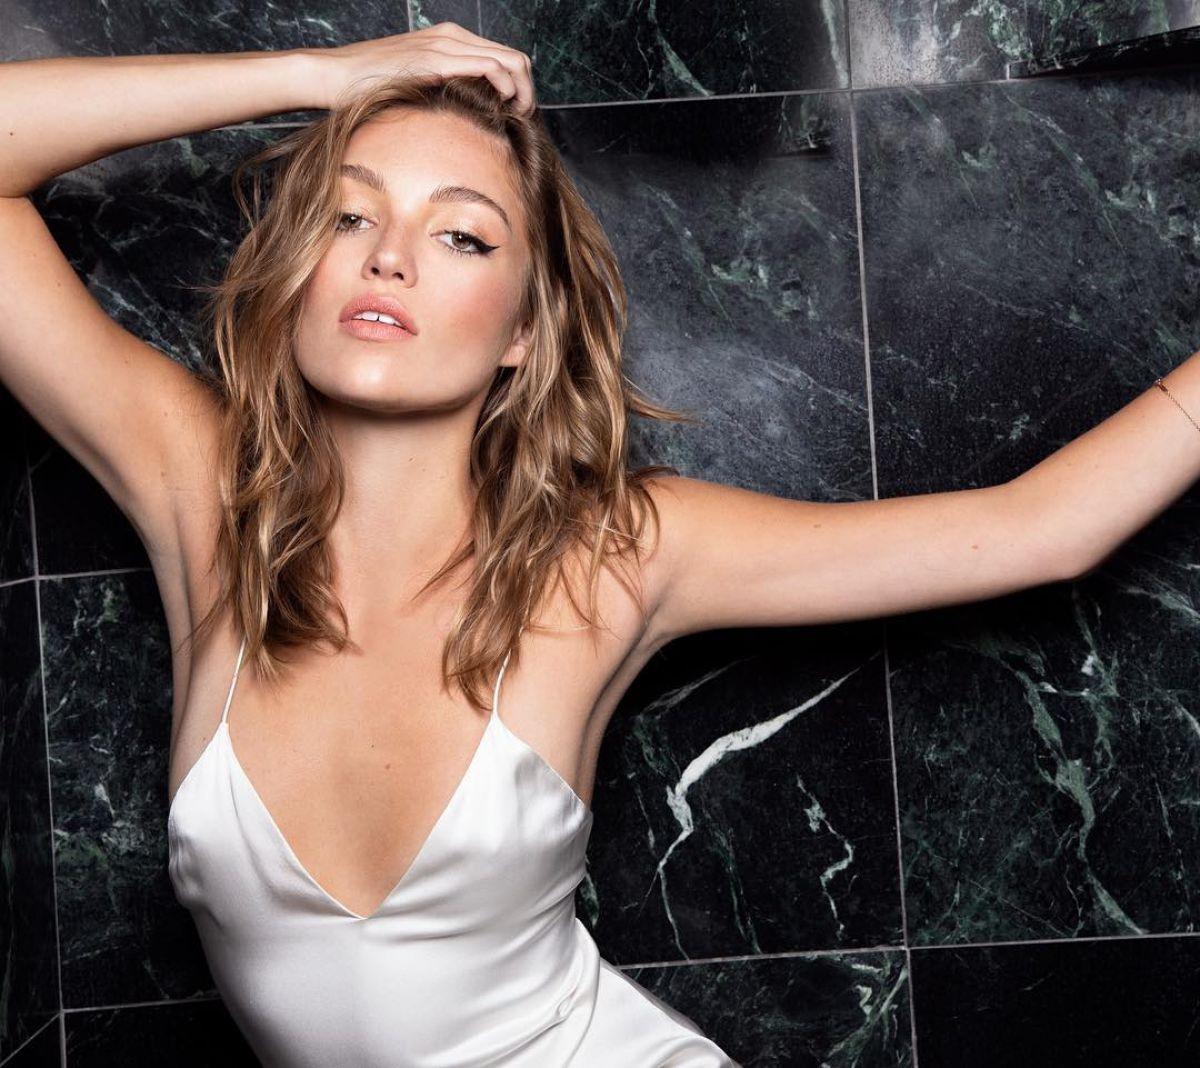 Pussy Alexandra Felstead naked (82 photos), Tits, Fappening, Boobs, legs 2015